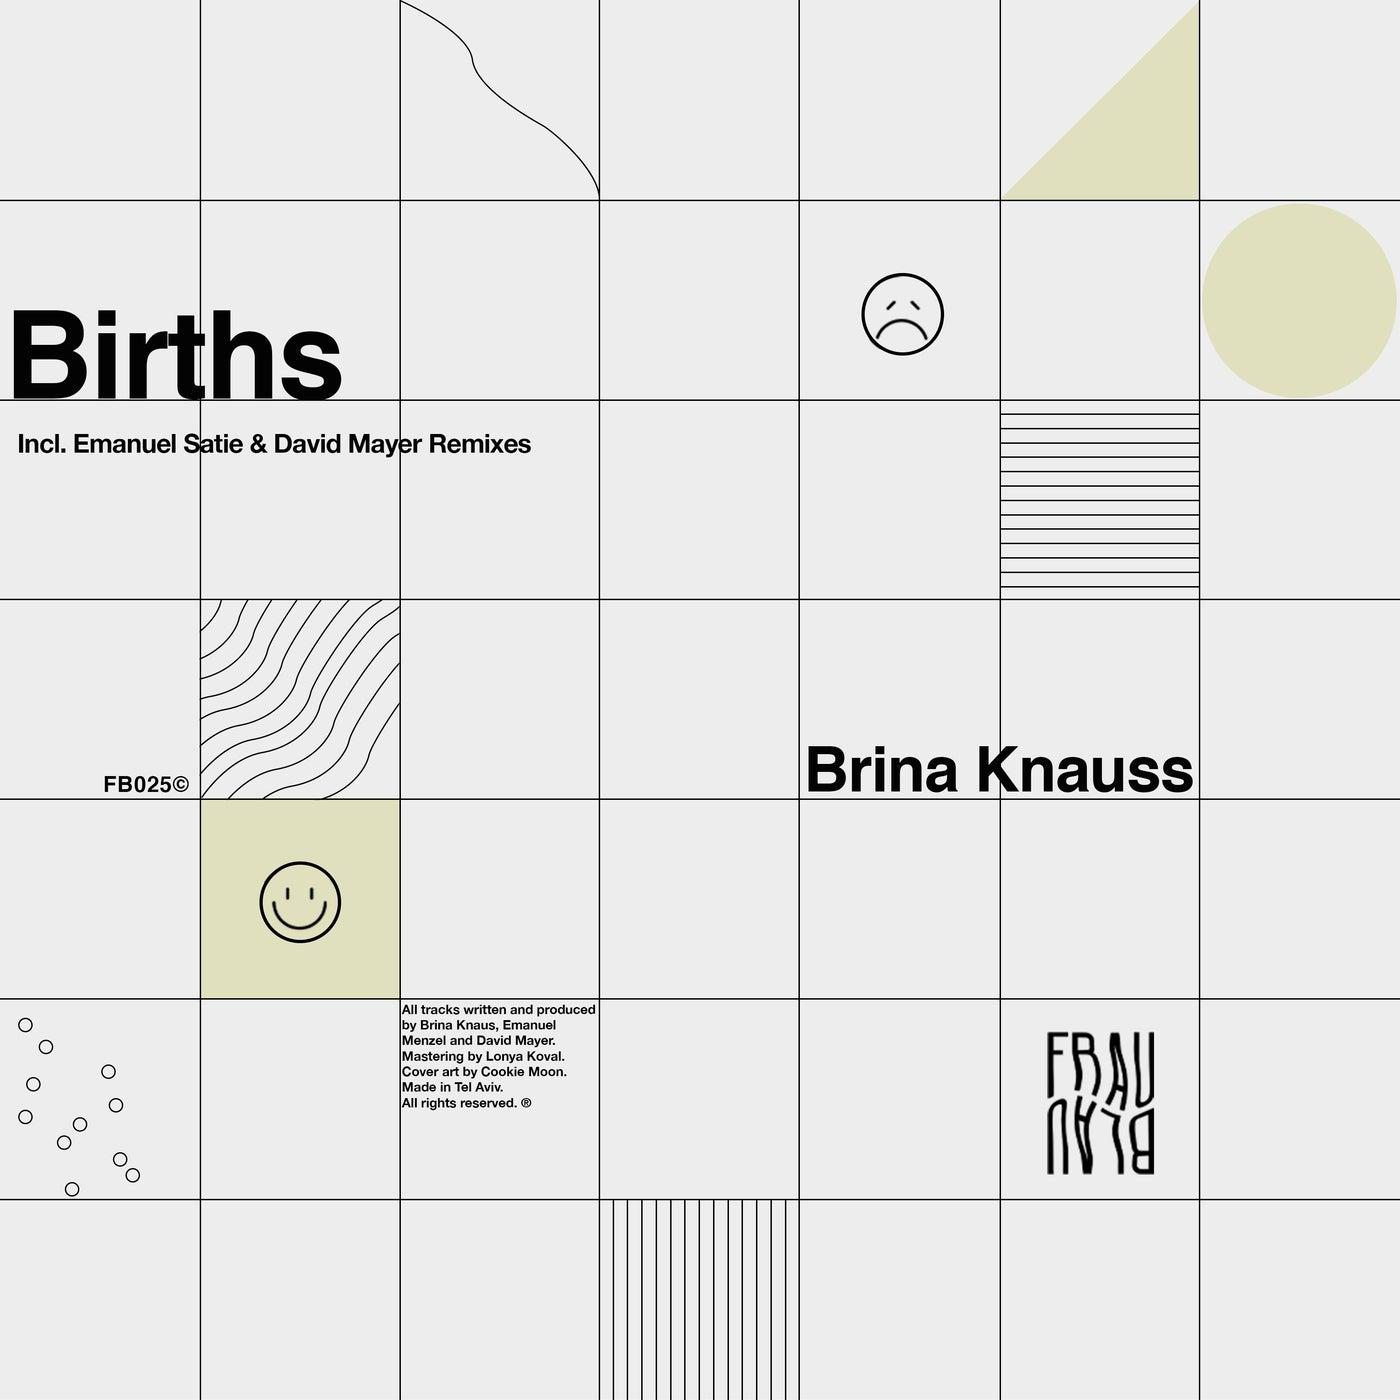 Births (David Mayer Remix)